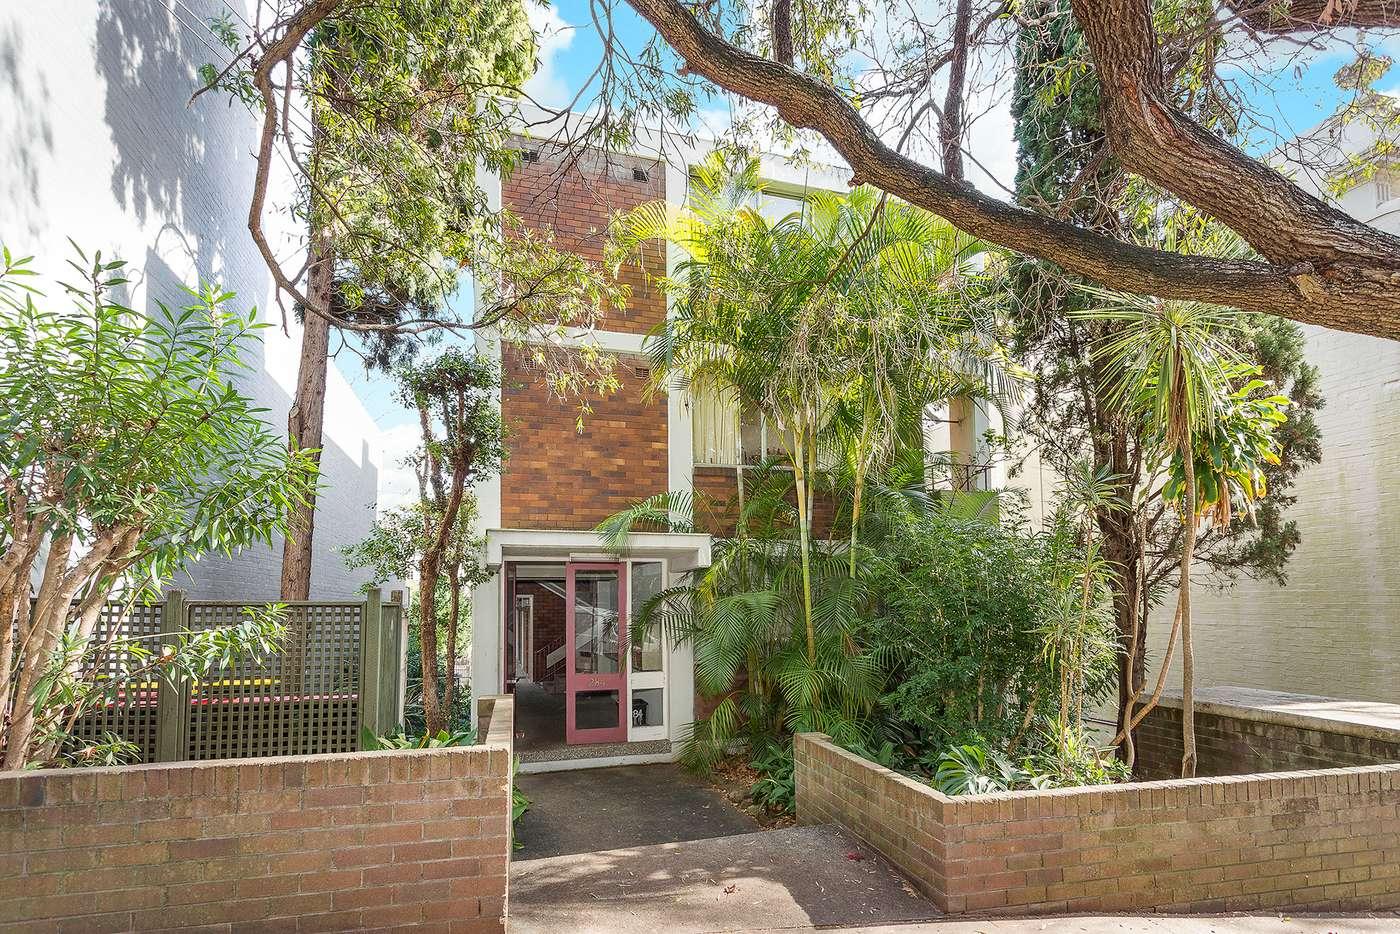 Main view of Homely studio listing, 284 Glenmore Road, Paddington NSW 2021